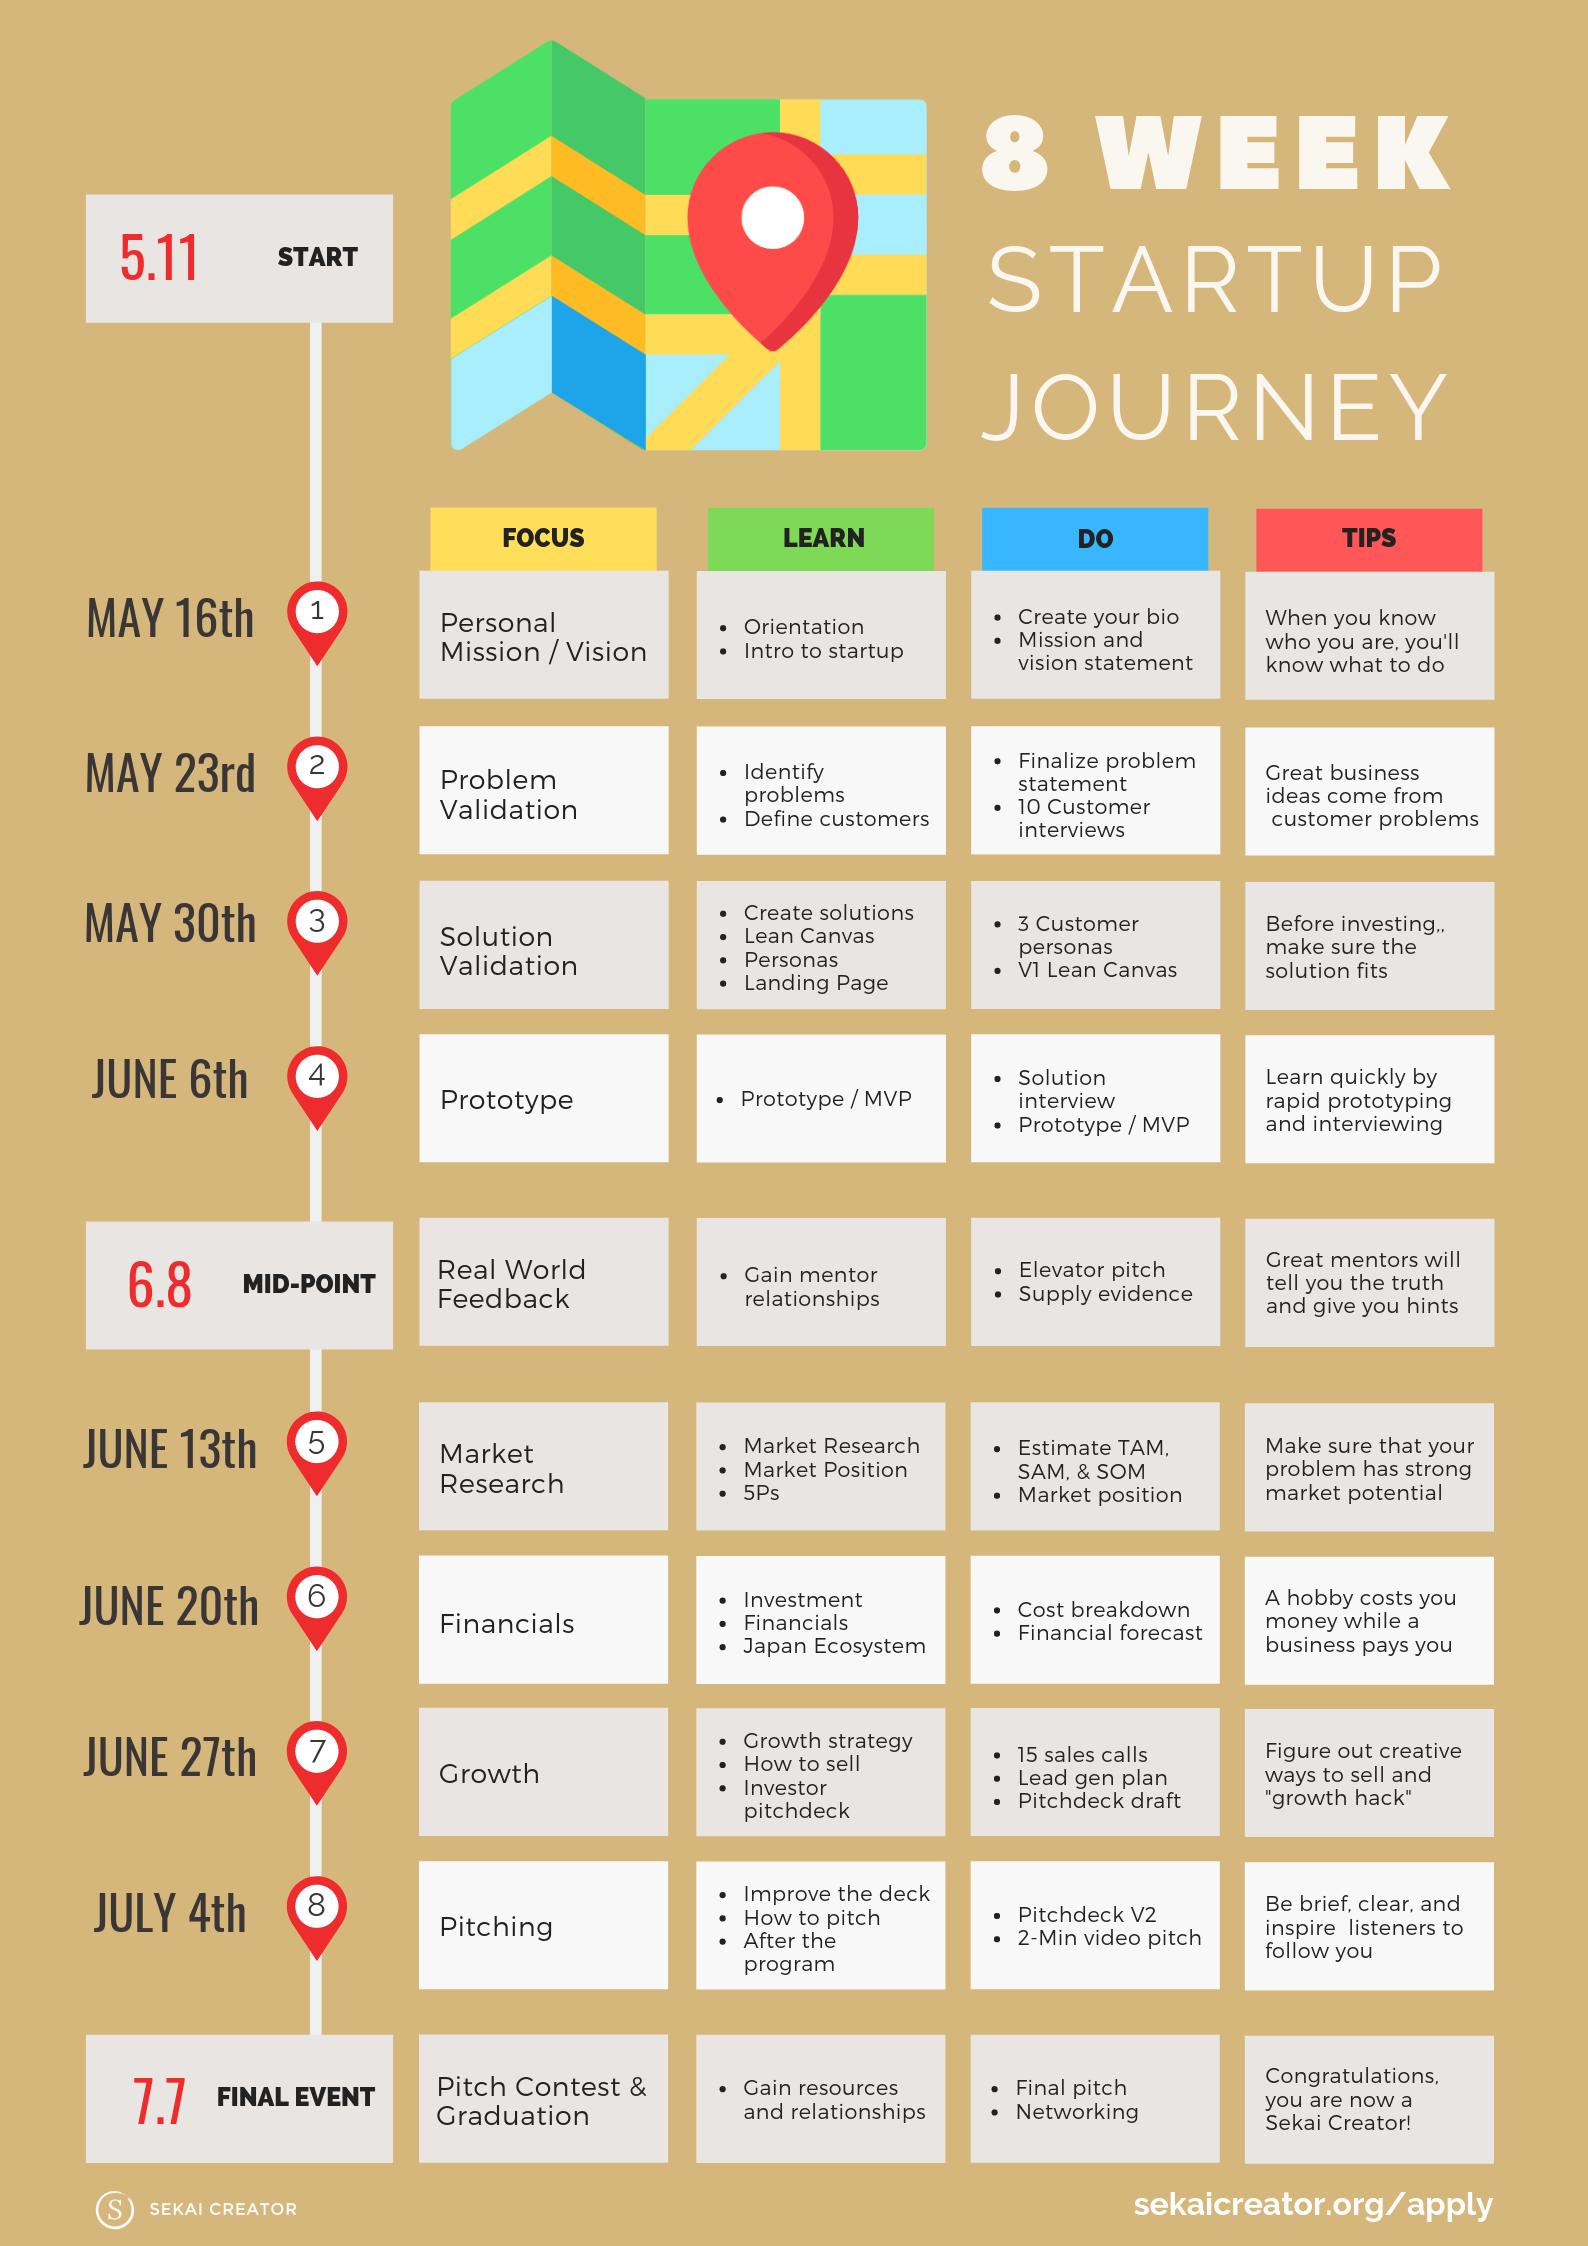 8 Week Startup Journey Sekai Creator Schedule SQ19.png